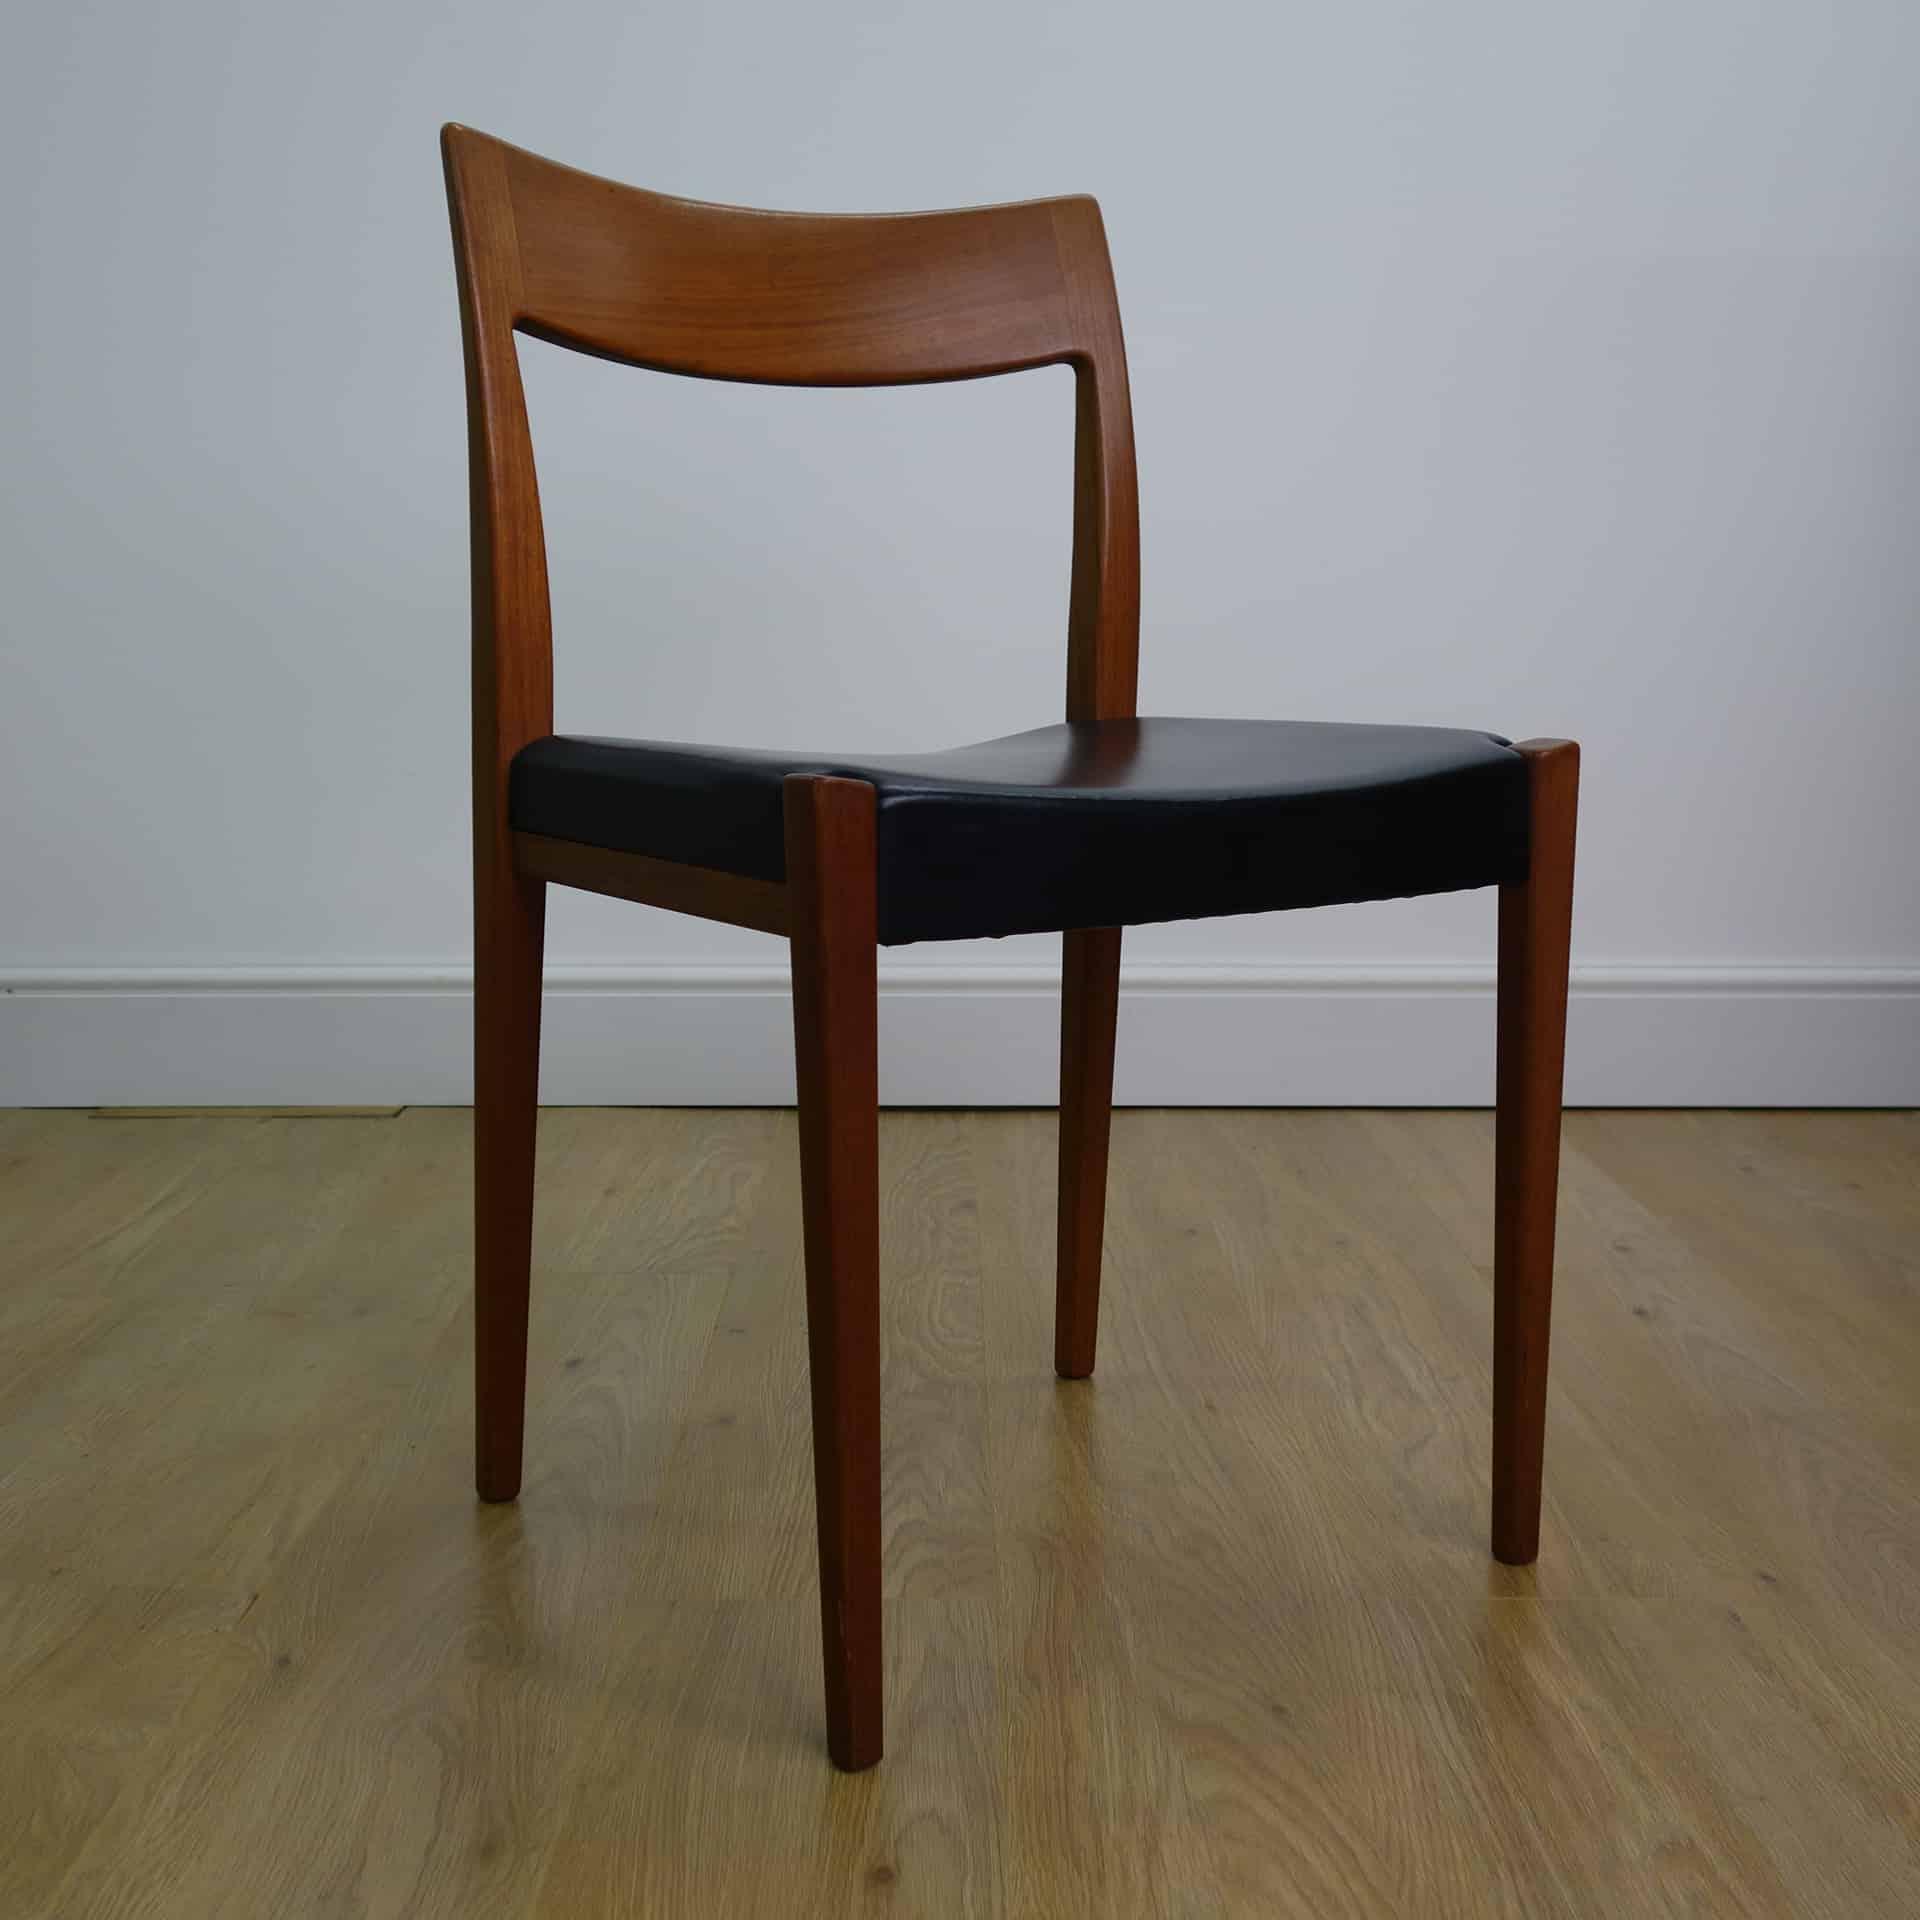 Swedish teak dining chairs by Yngve Ekstrom for Troeds